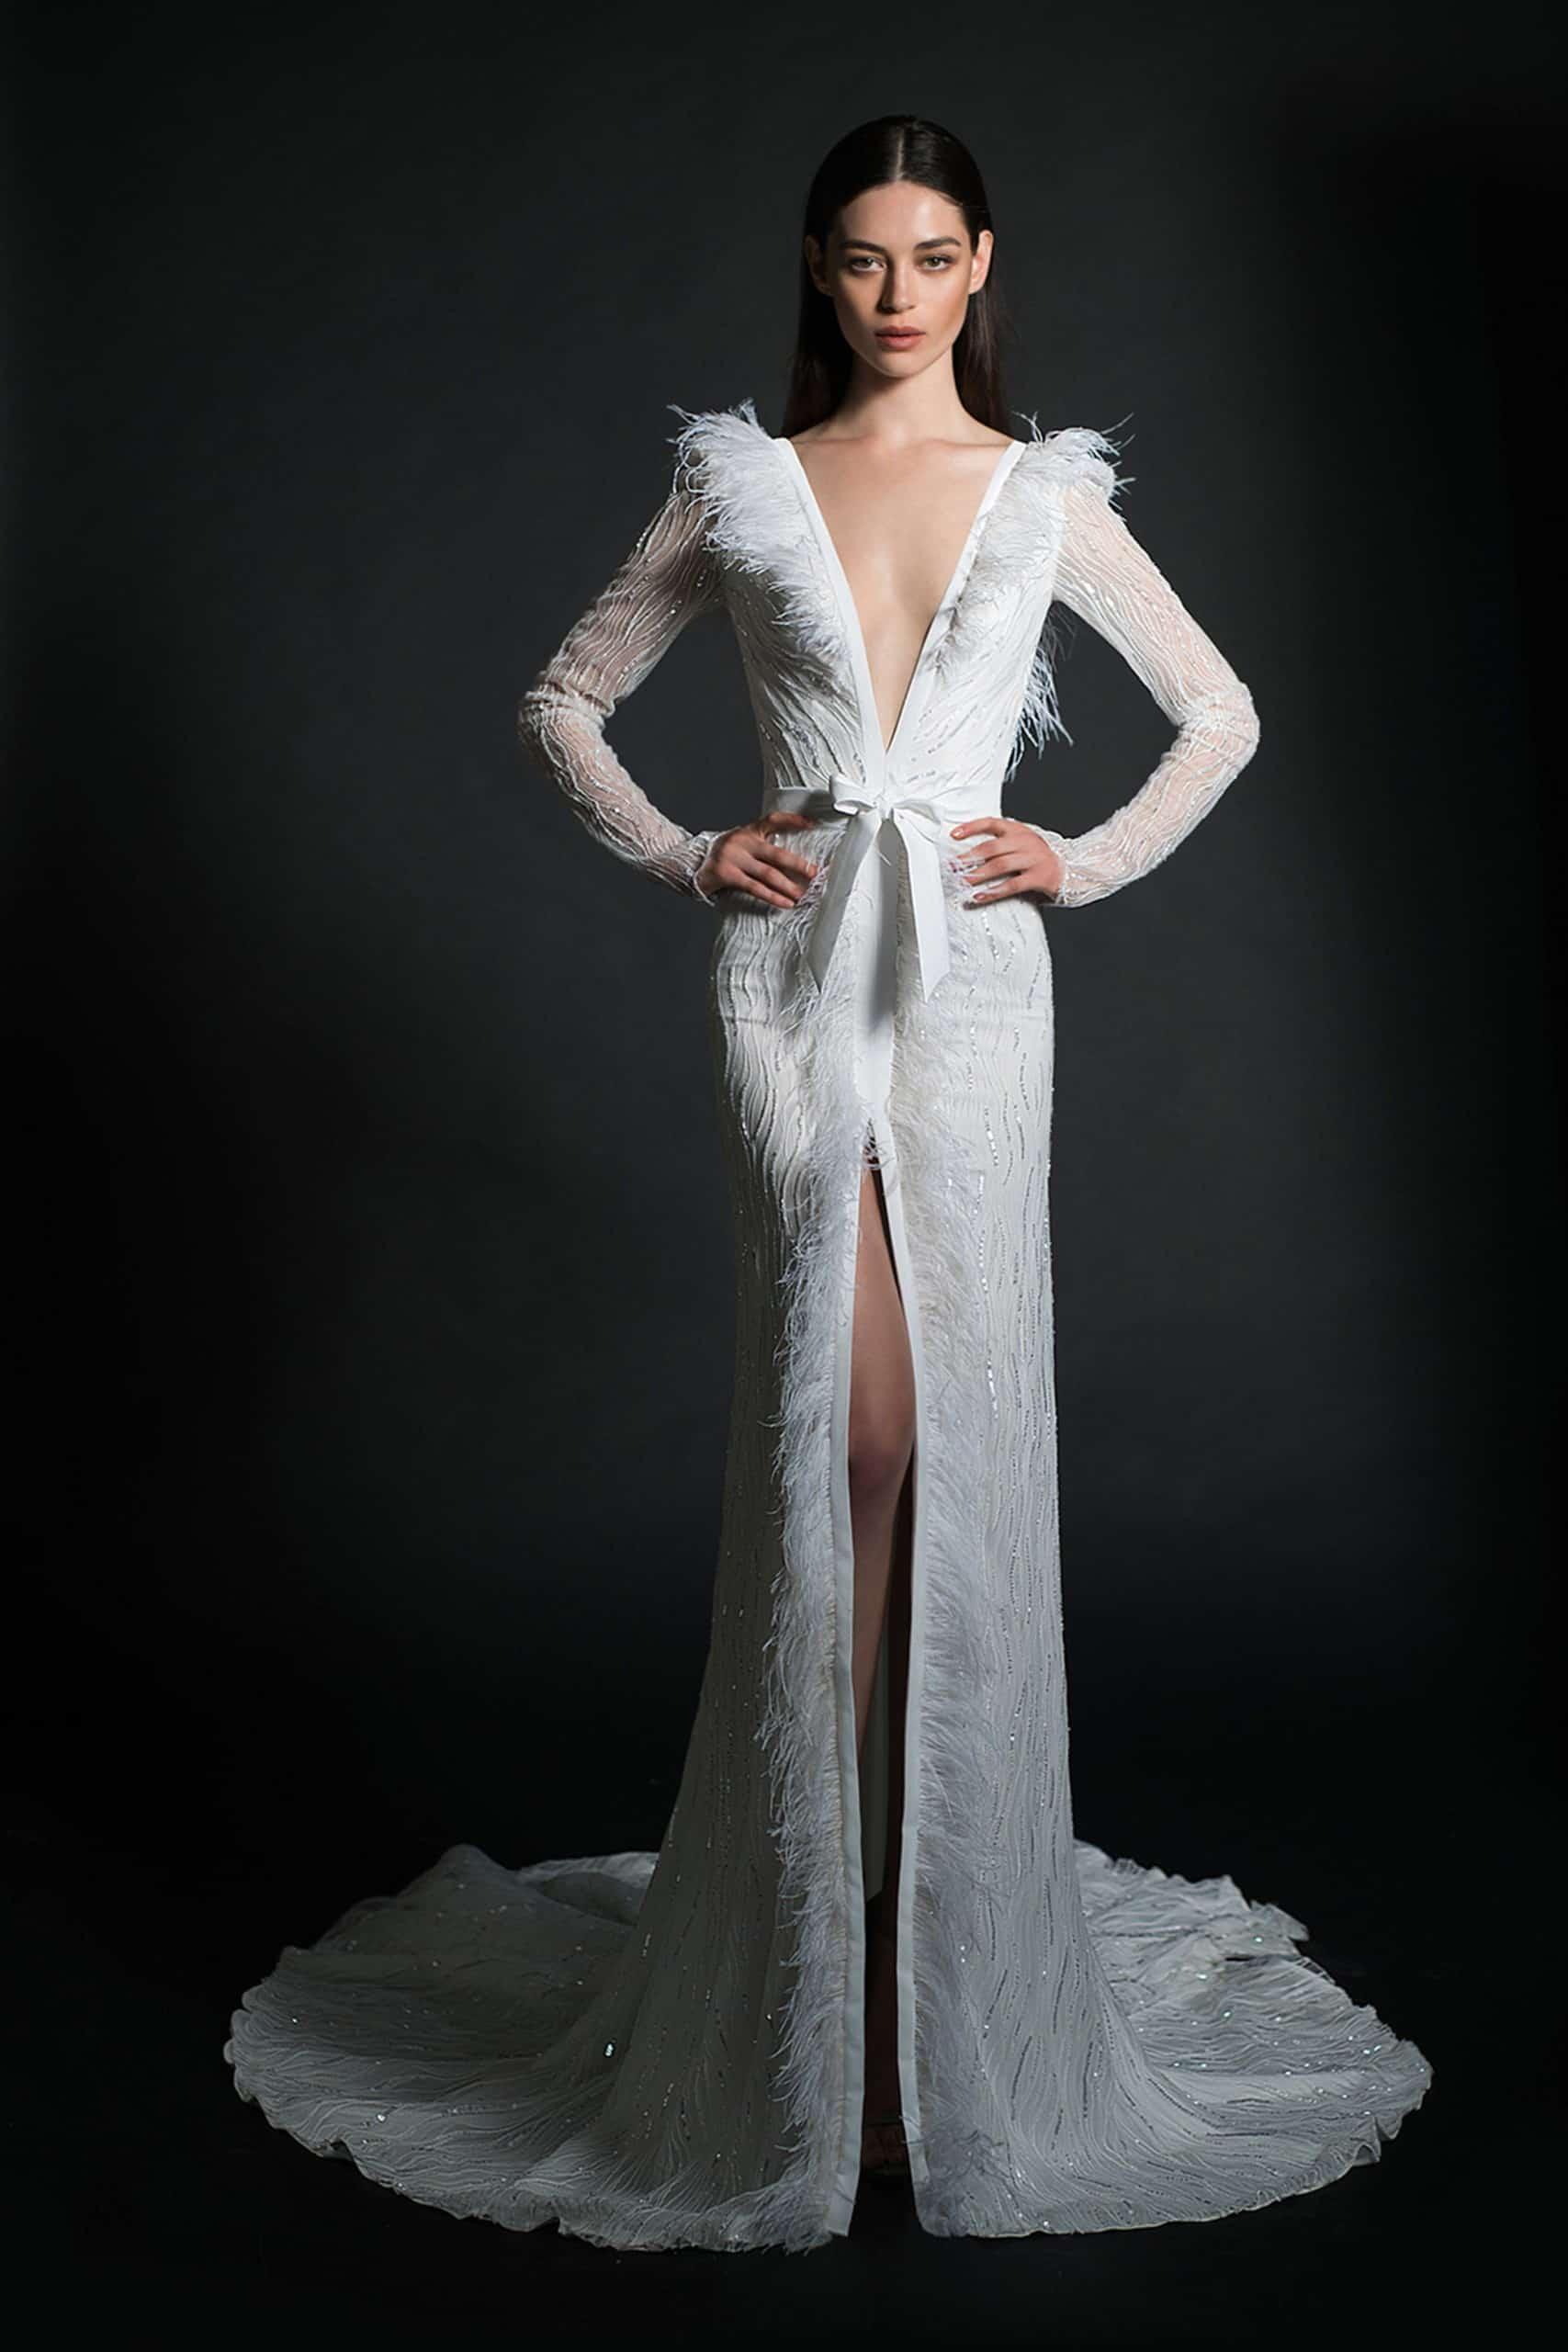 v neck wedding dress with a small bow around the waist by Inbal Dror